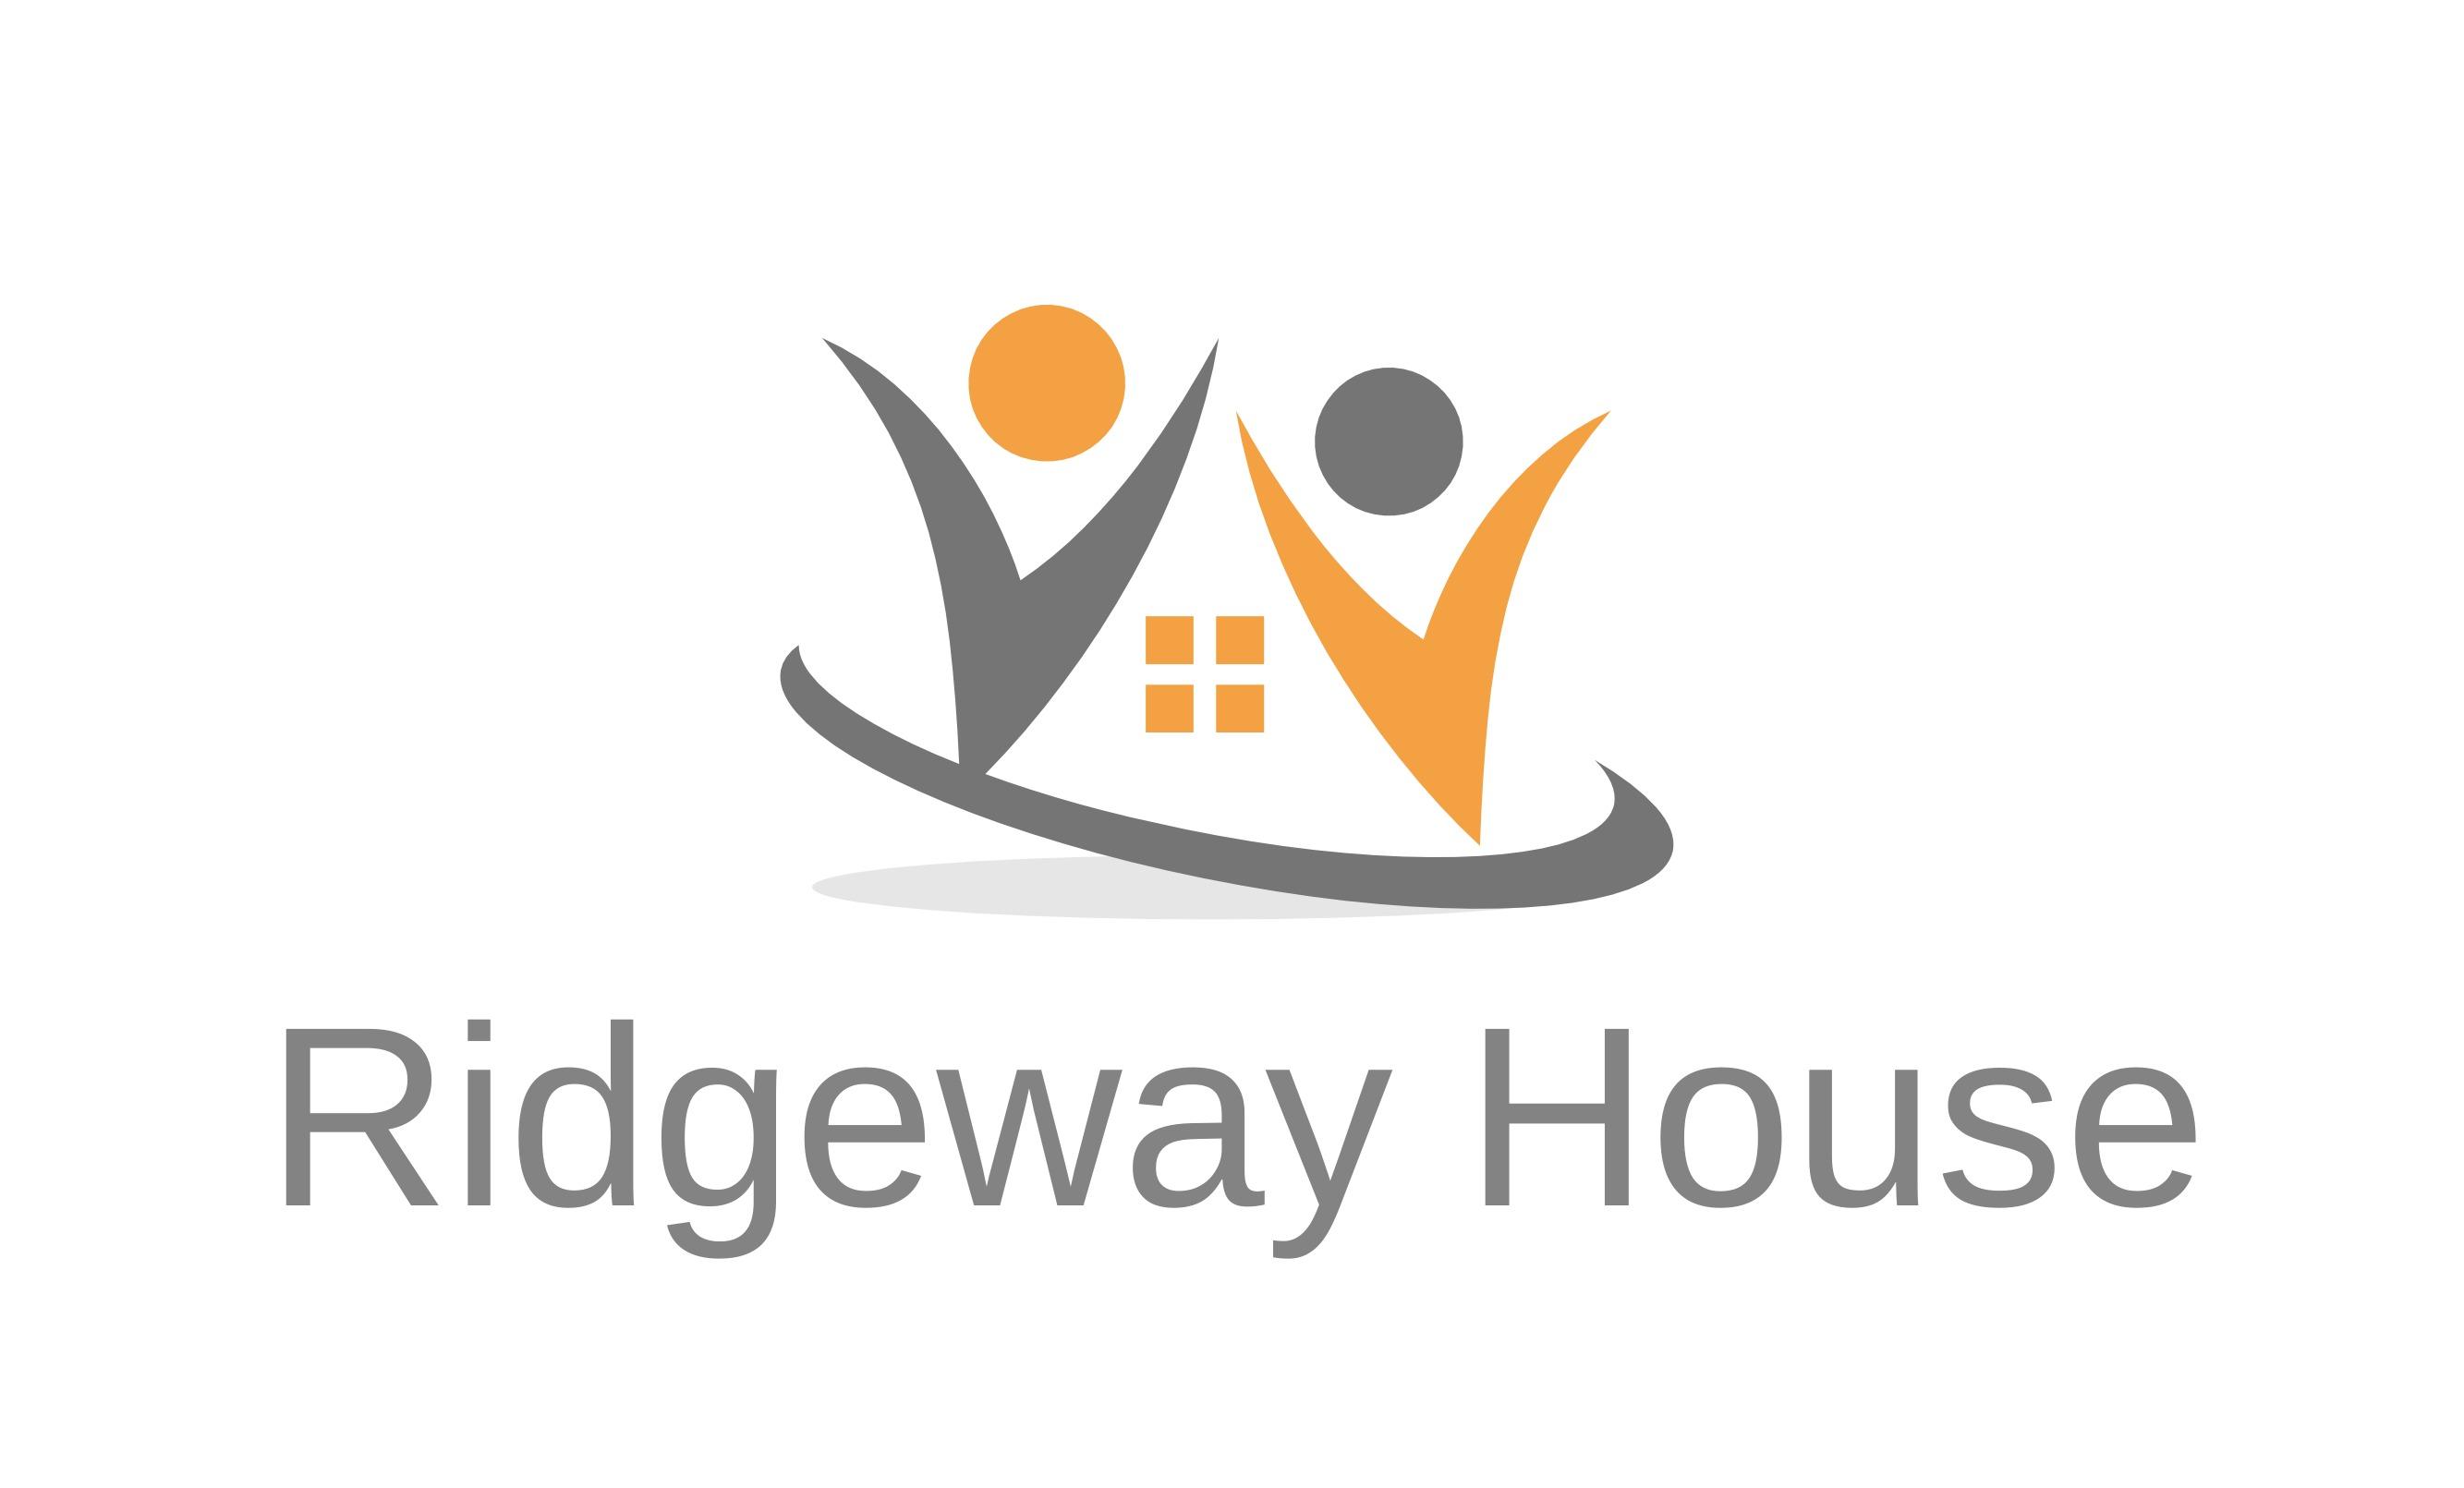 Ridgeway House (Bristol) Limited